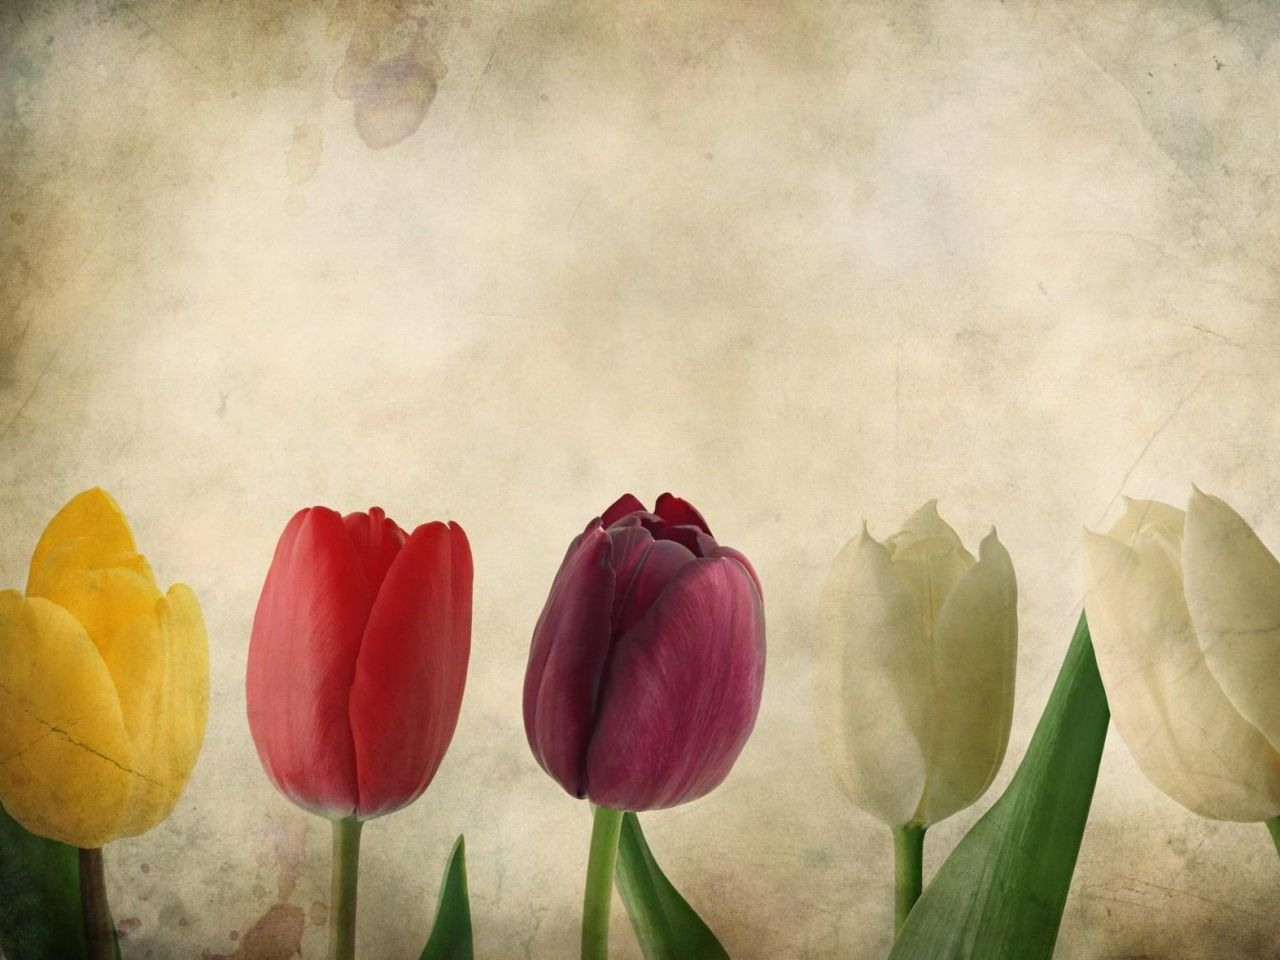 Fondos De Flores Wallpapers Hd Gratis